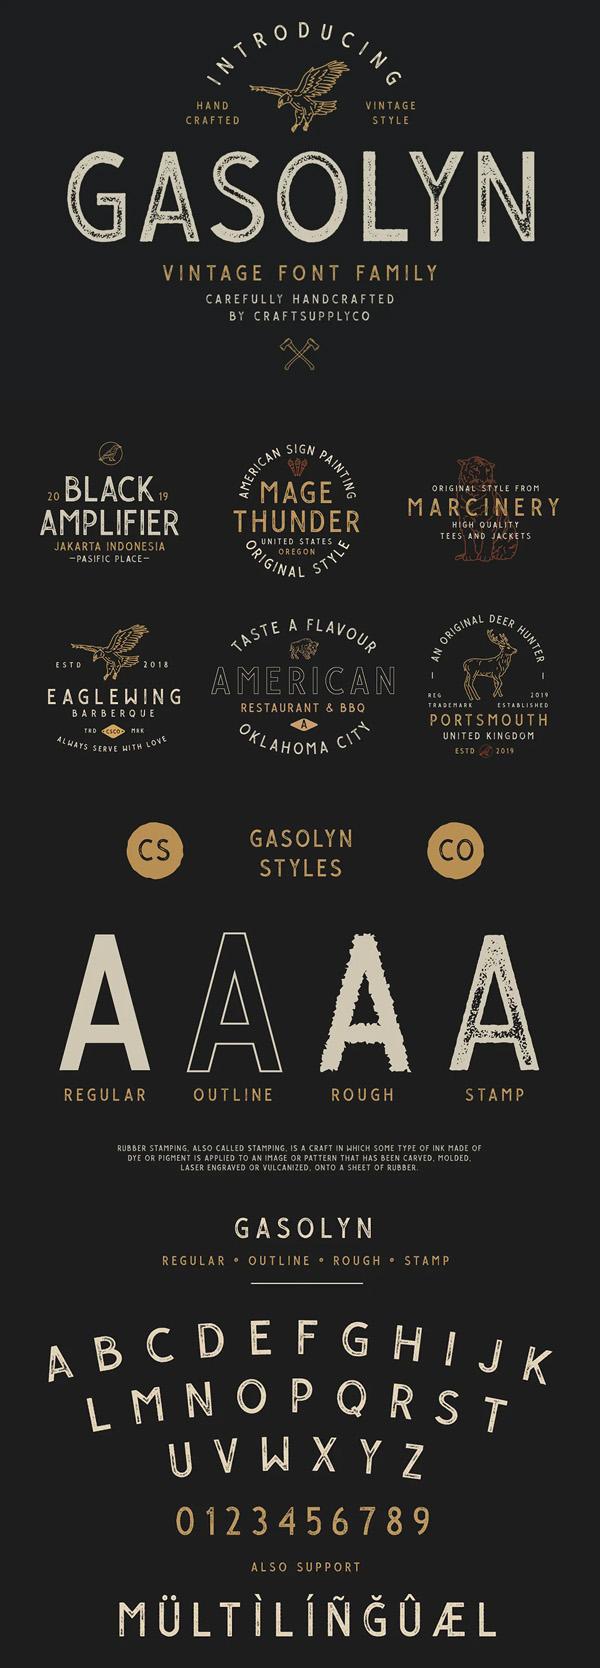 Gasolyn - Vintage Font Family